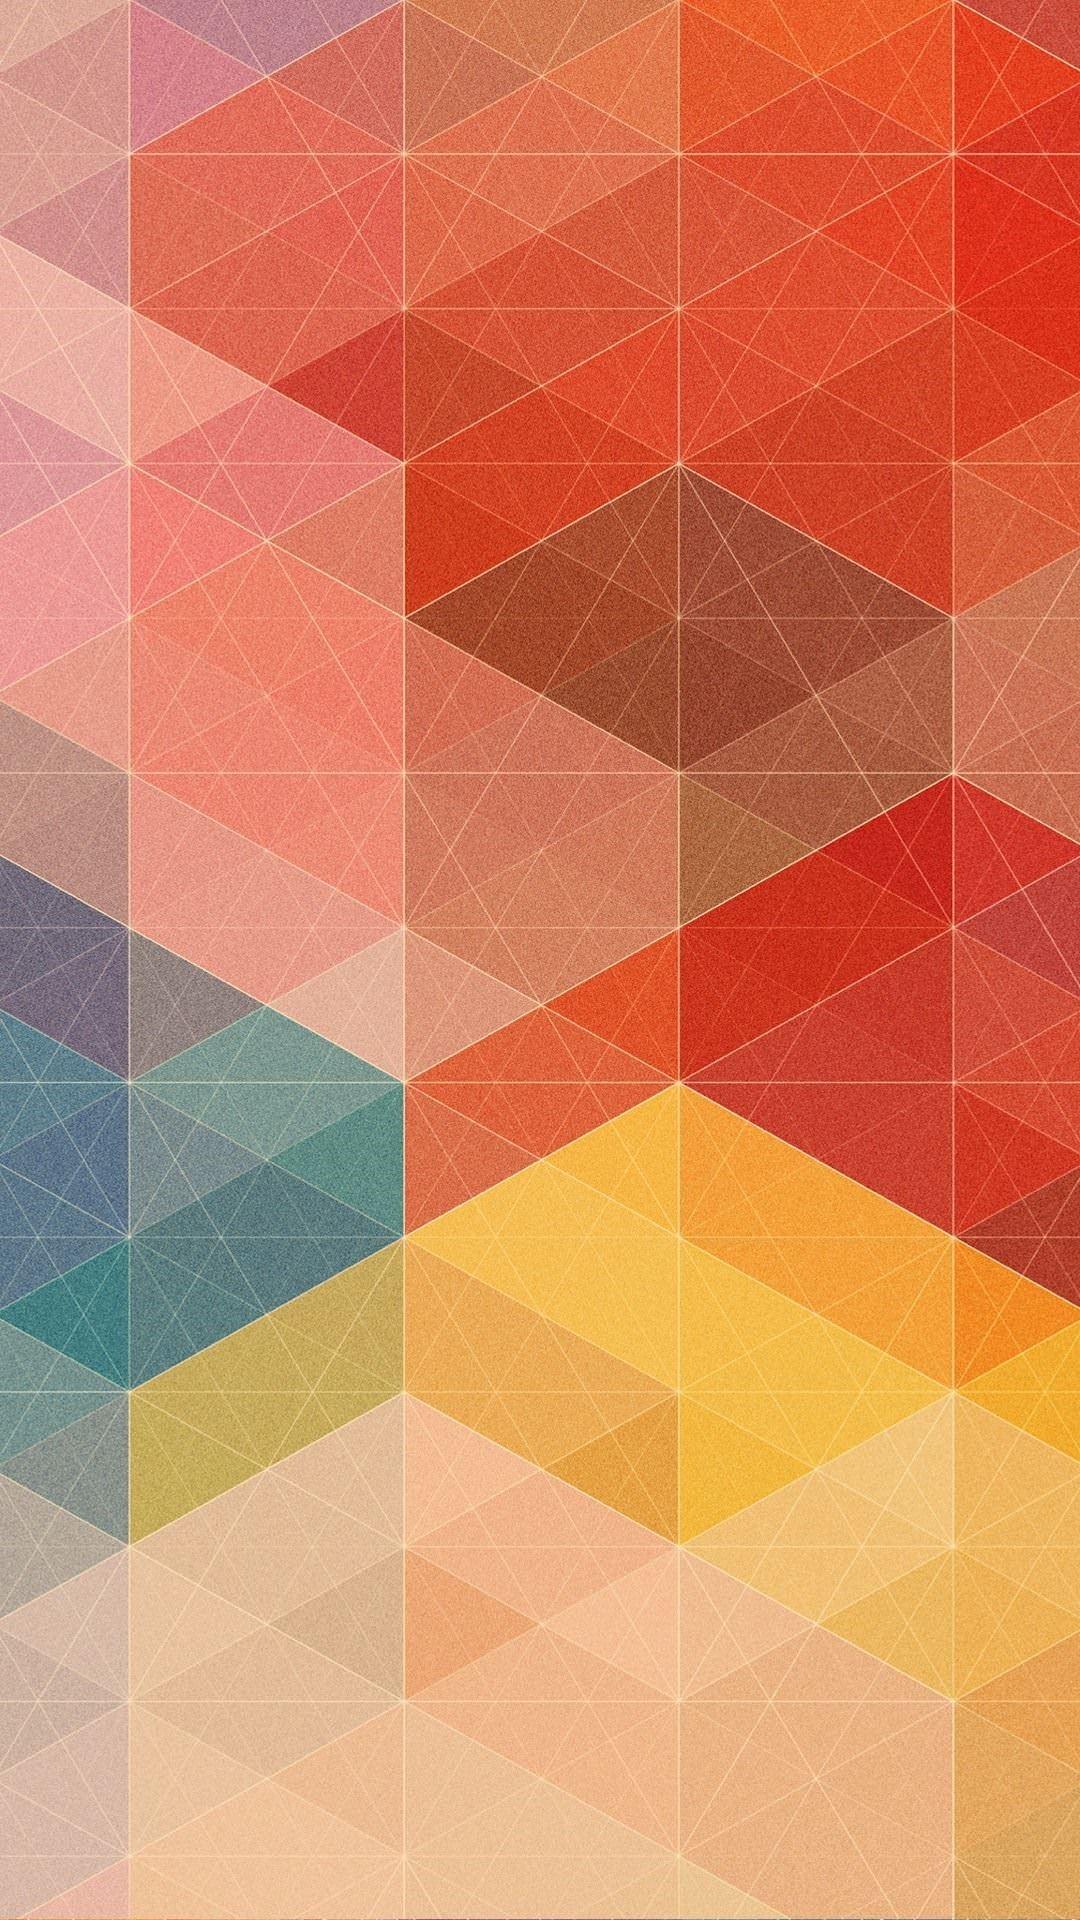 Pattern iphone 8 wallpaper